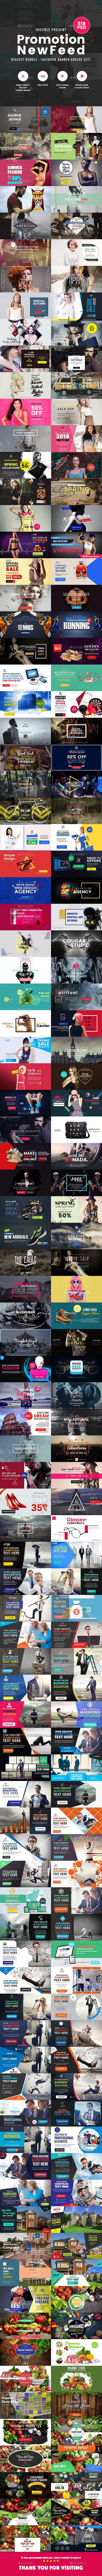 [Biggest Bundle] - Promotion Facebook Banner Ads - 518 PSD [02 Size Each]  Download Now:  https://graphicriver.net/item/special-bundle-promotion-newsfeed-banner-ads-269-psd-02-size-each/19432301?ref=iDoodle